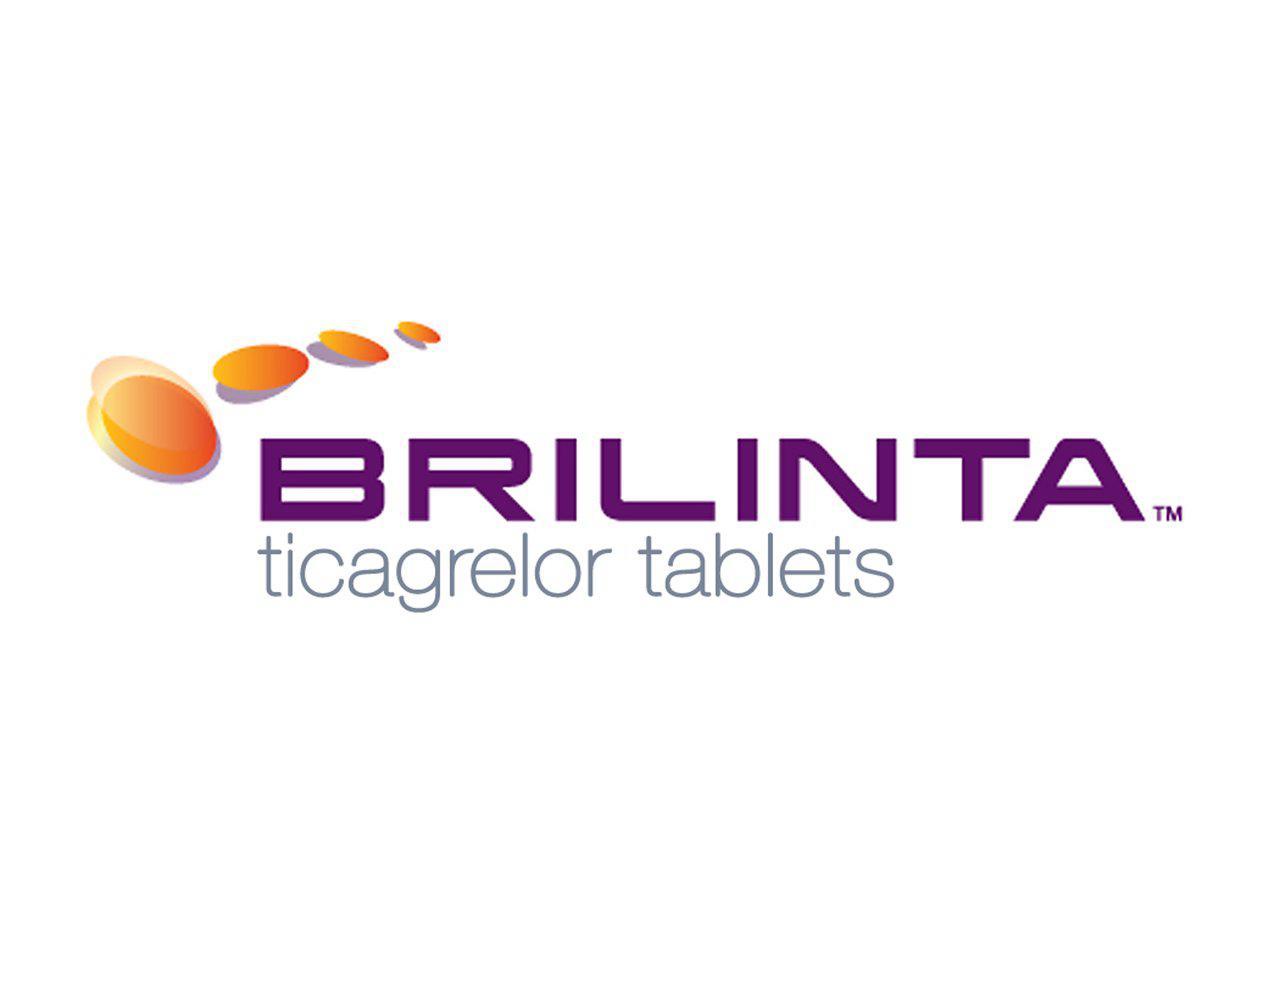 Brilinta logo.jpg